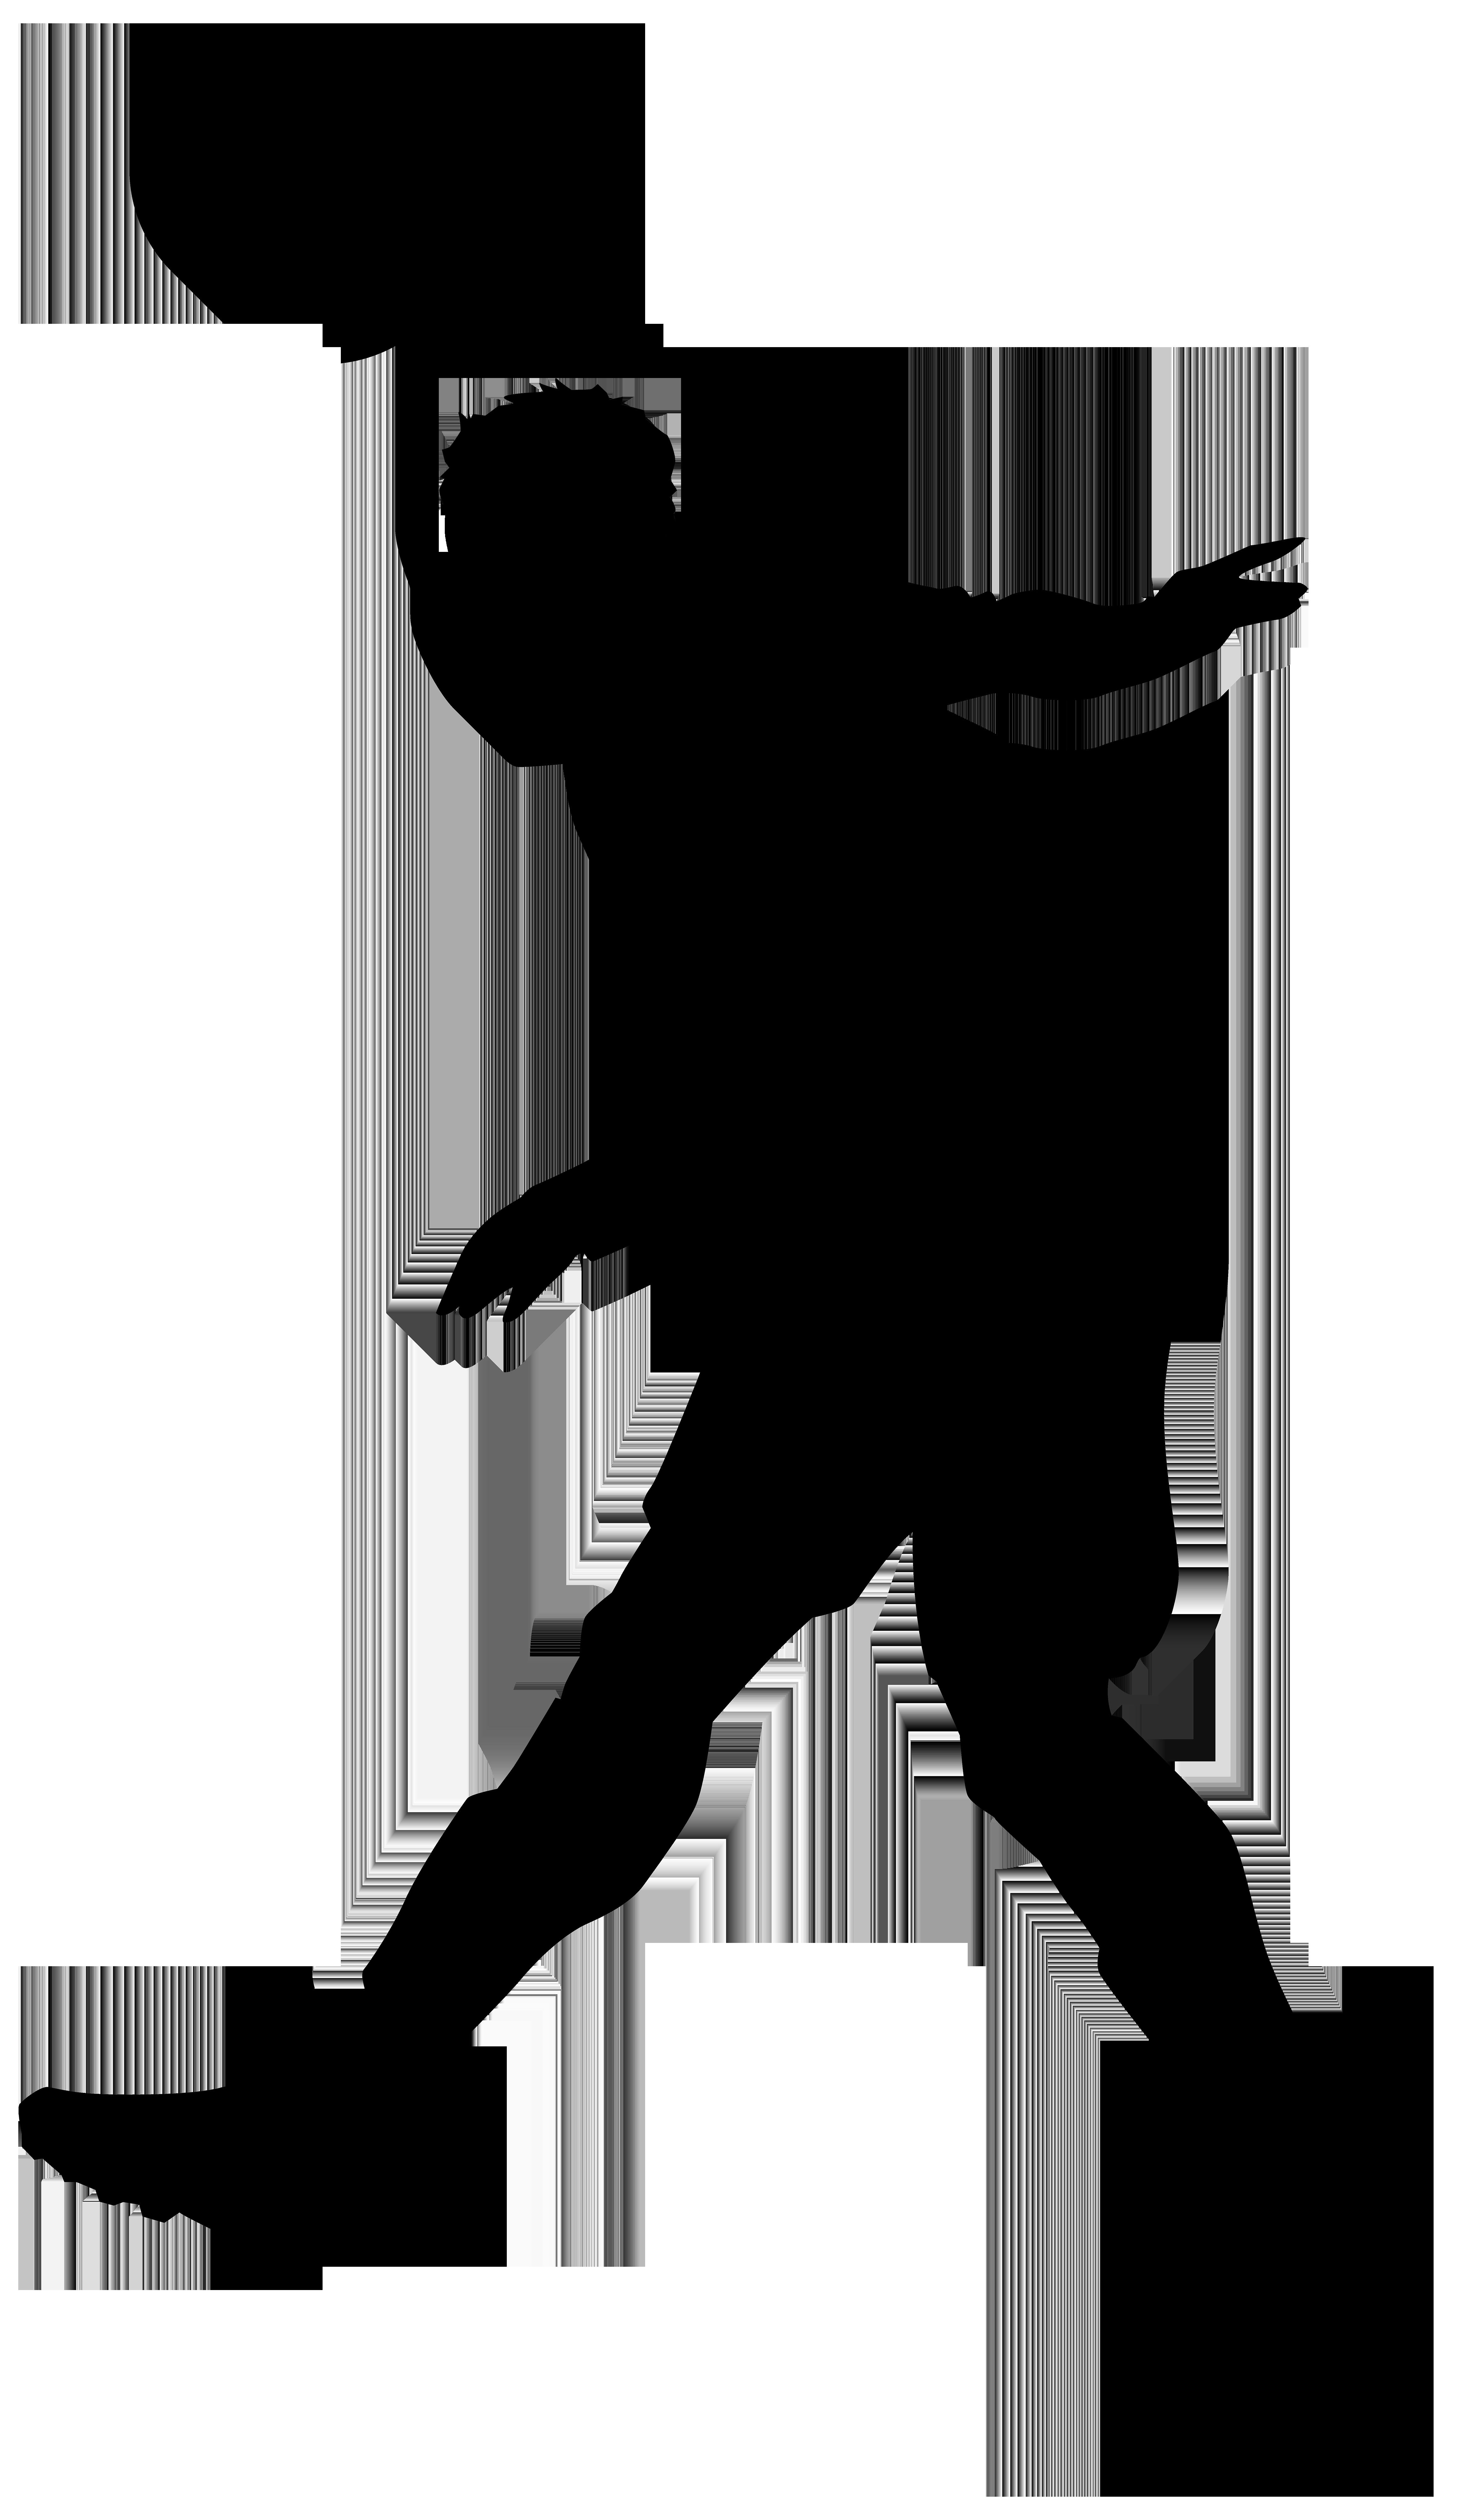 Diagram Footballer Football Silhouette Free Download Png Hq Football Silhouette Silhouette Art Silhouette Free